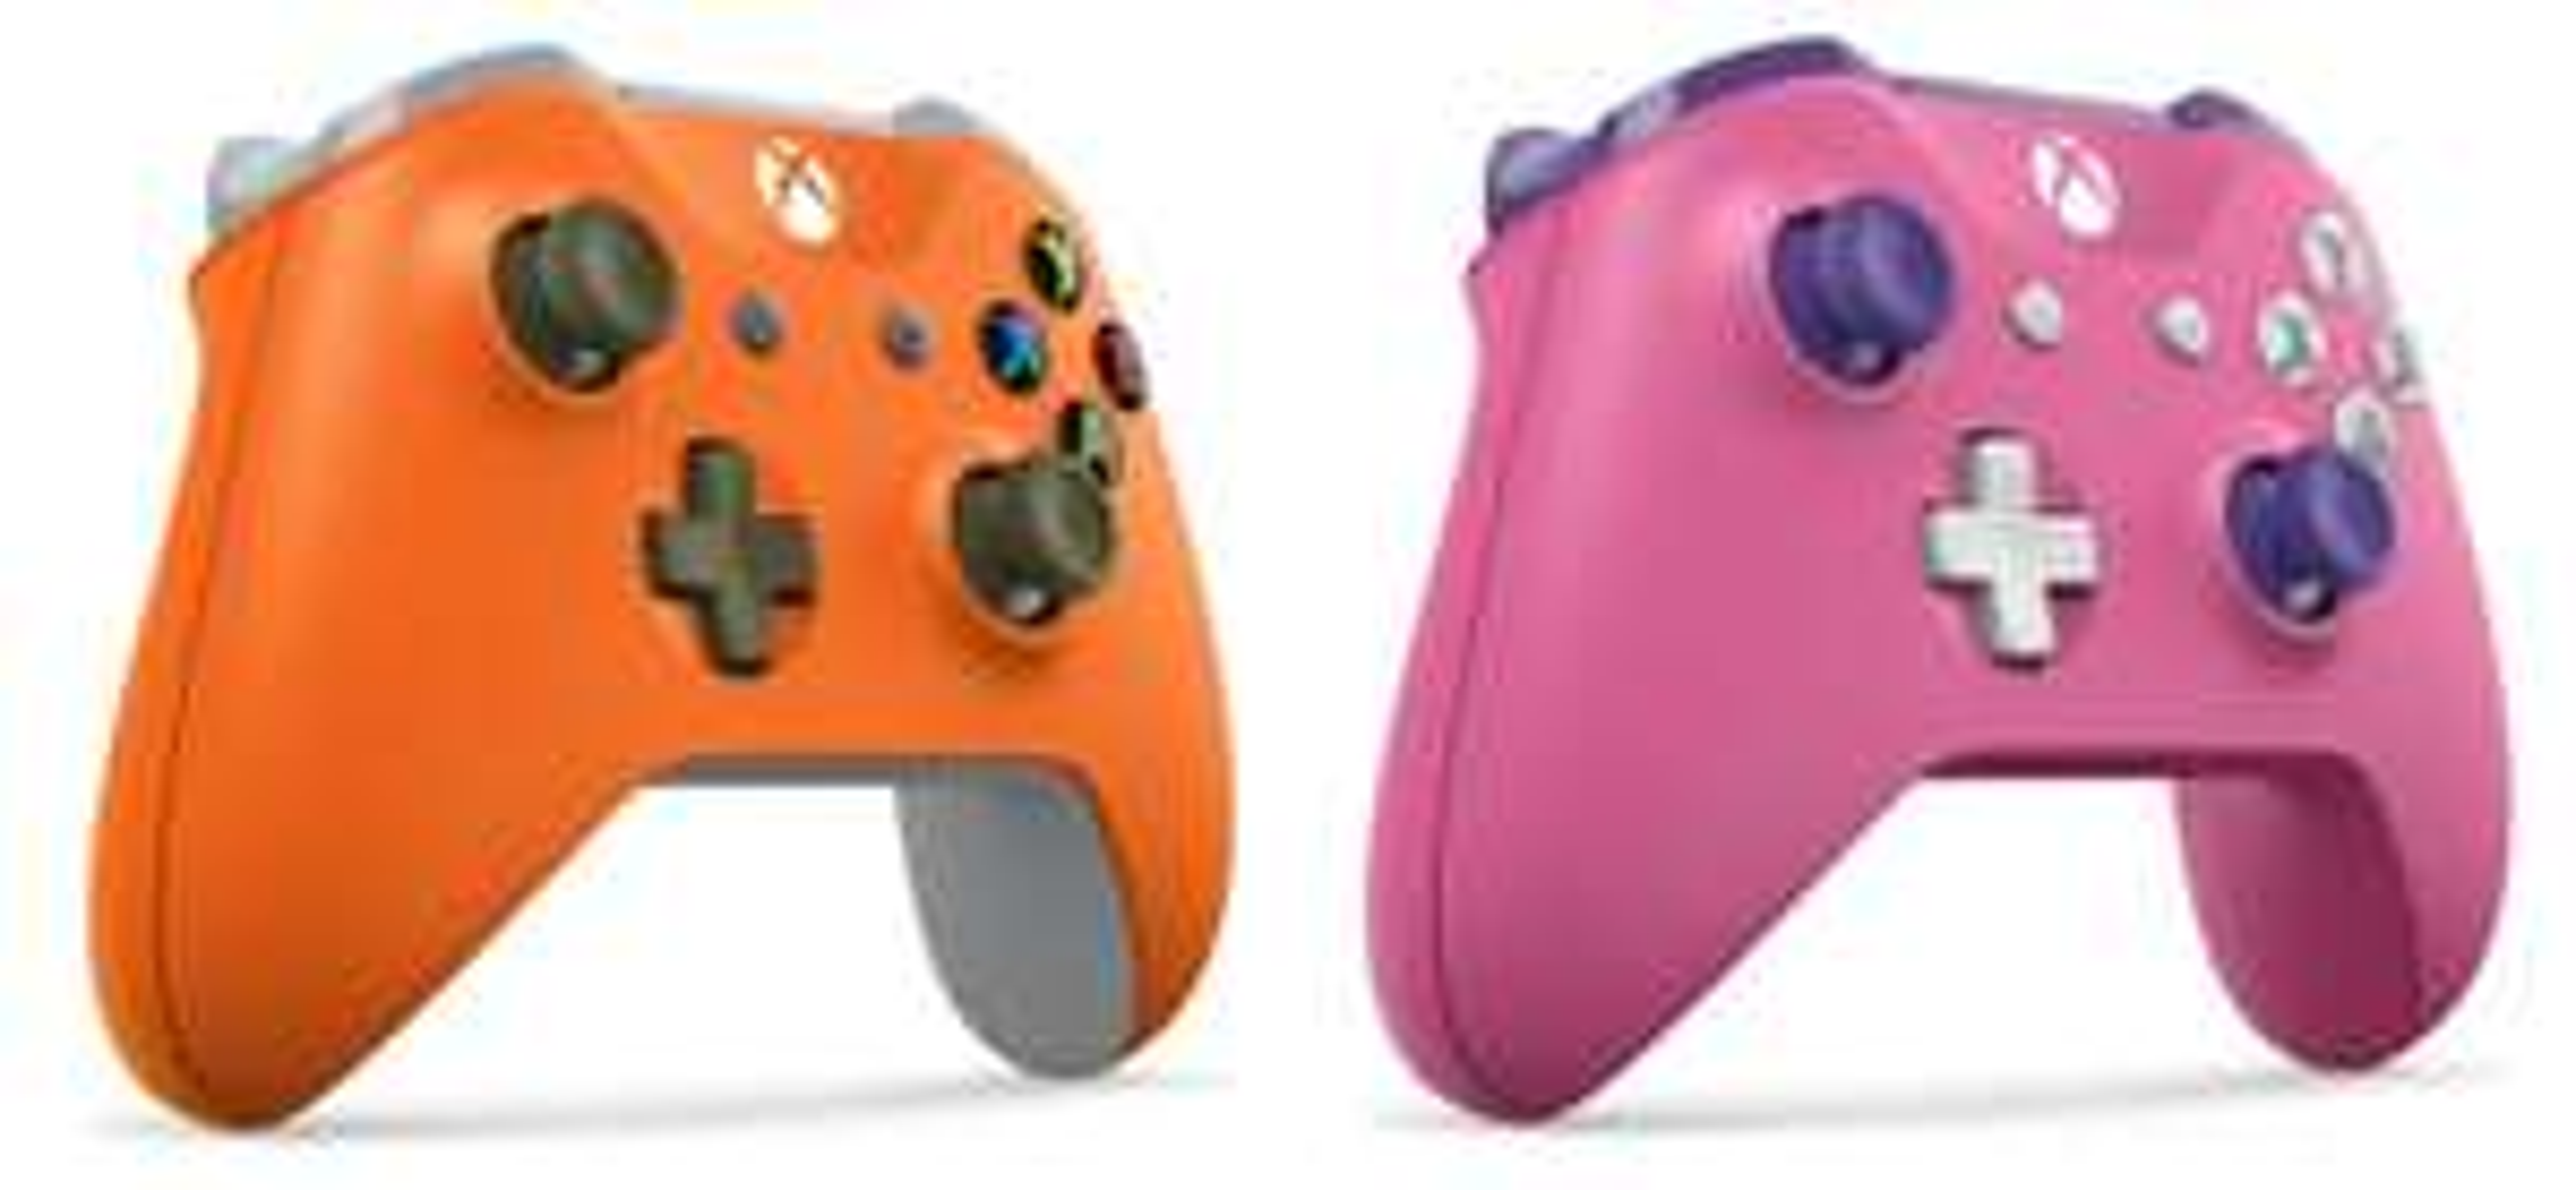 [Exclusive to Argos] Xbox Wireless Controller – Zest Orange / Military Green or Deep Pink / Regal Purple £39.99 Free C&C @ Argos / Argos eBay